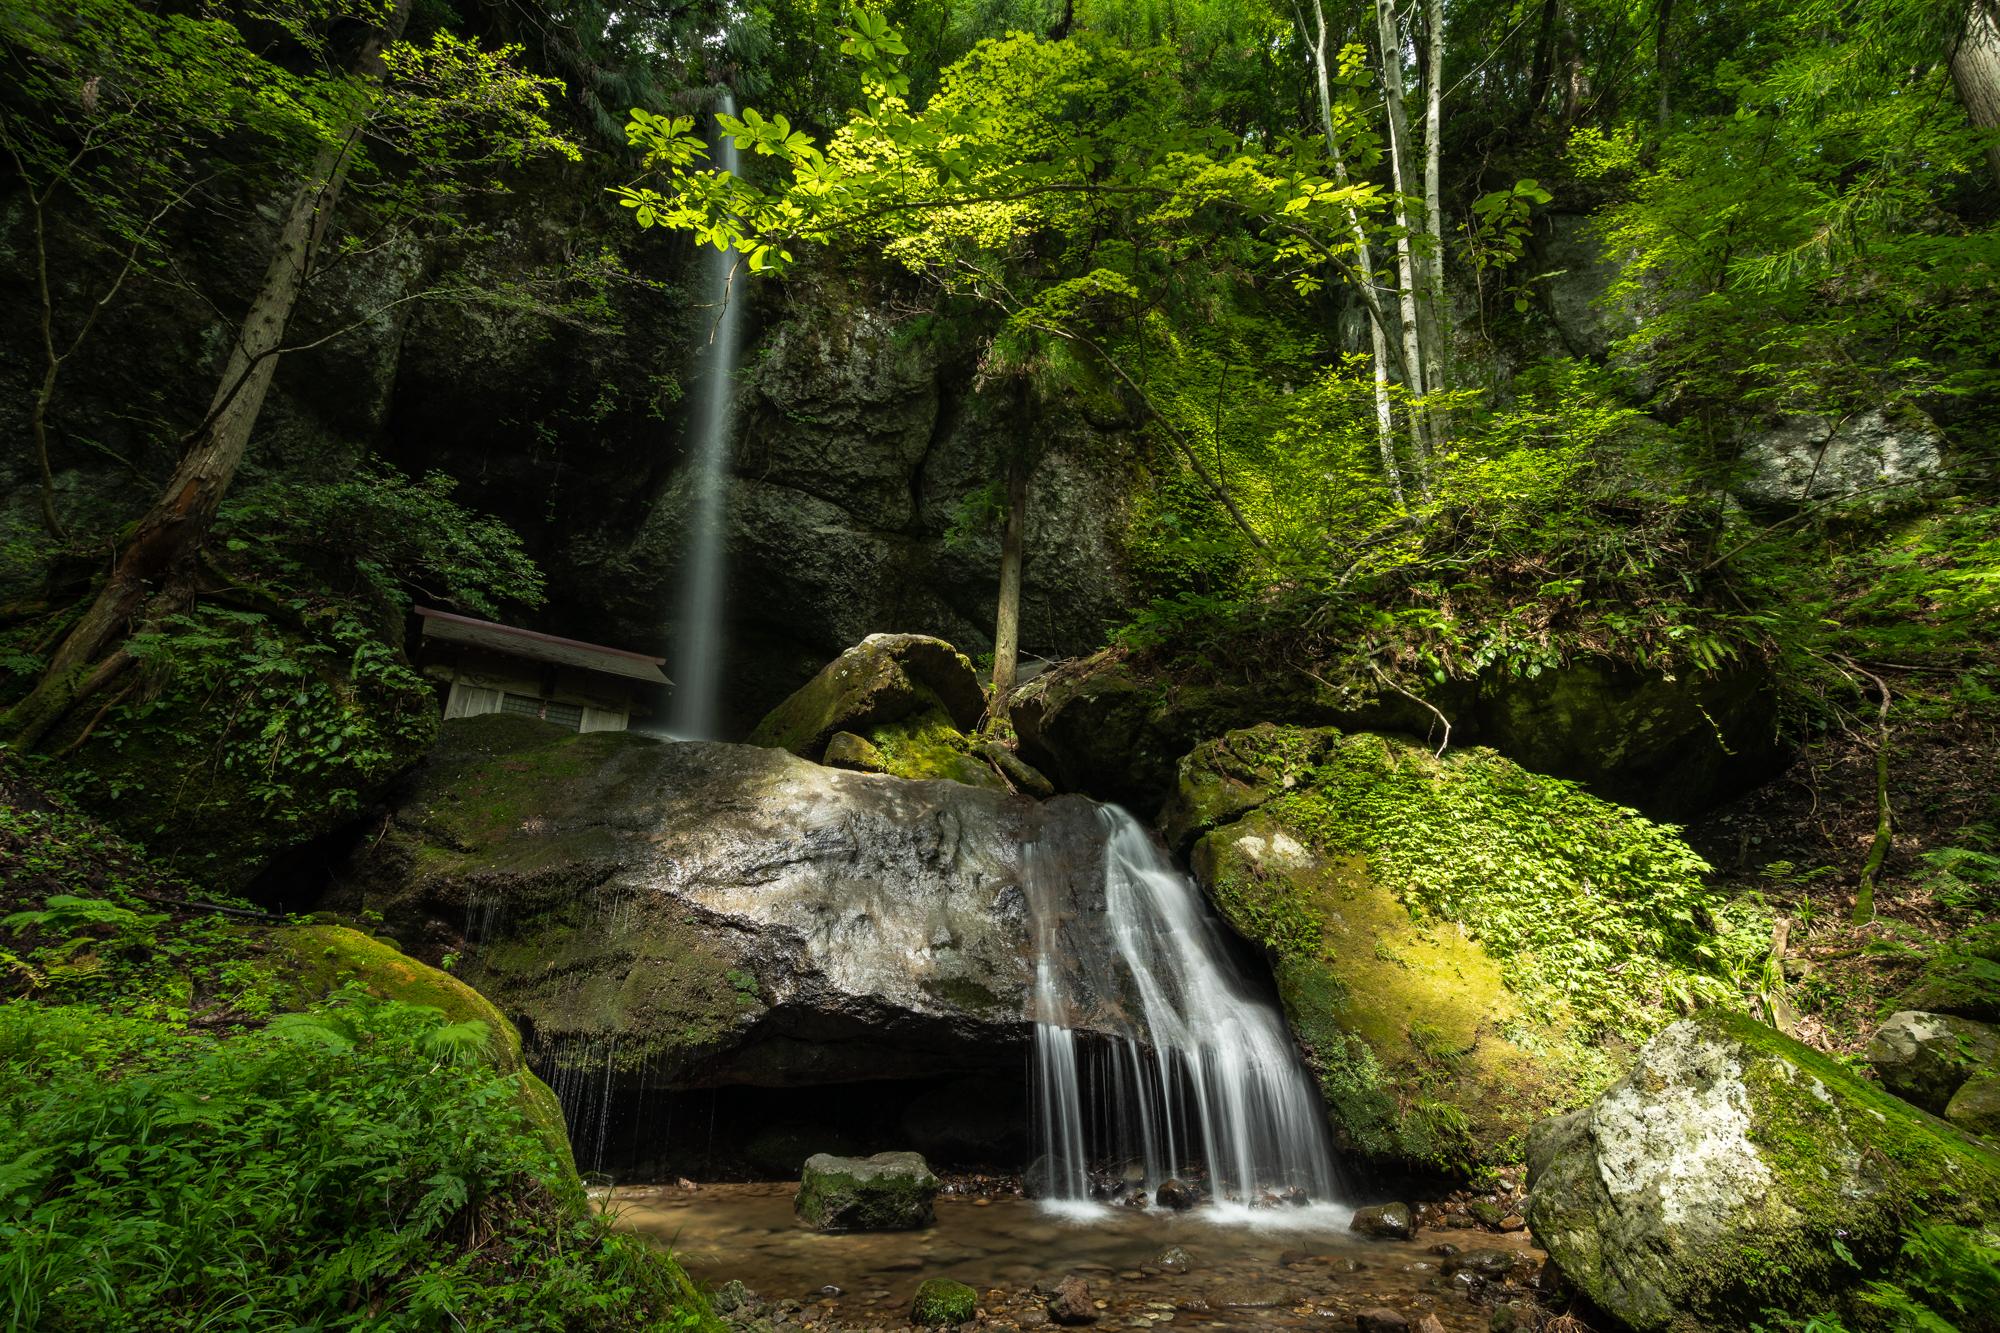 DSC01014 兵庫県 吉滝(滝と神社の幻想的な景色!  関西・近畿・兵庫県の滝スポット!撮影した写真の紹介、 アクセス情報や撮影ポイントなど!)